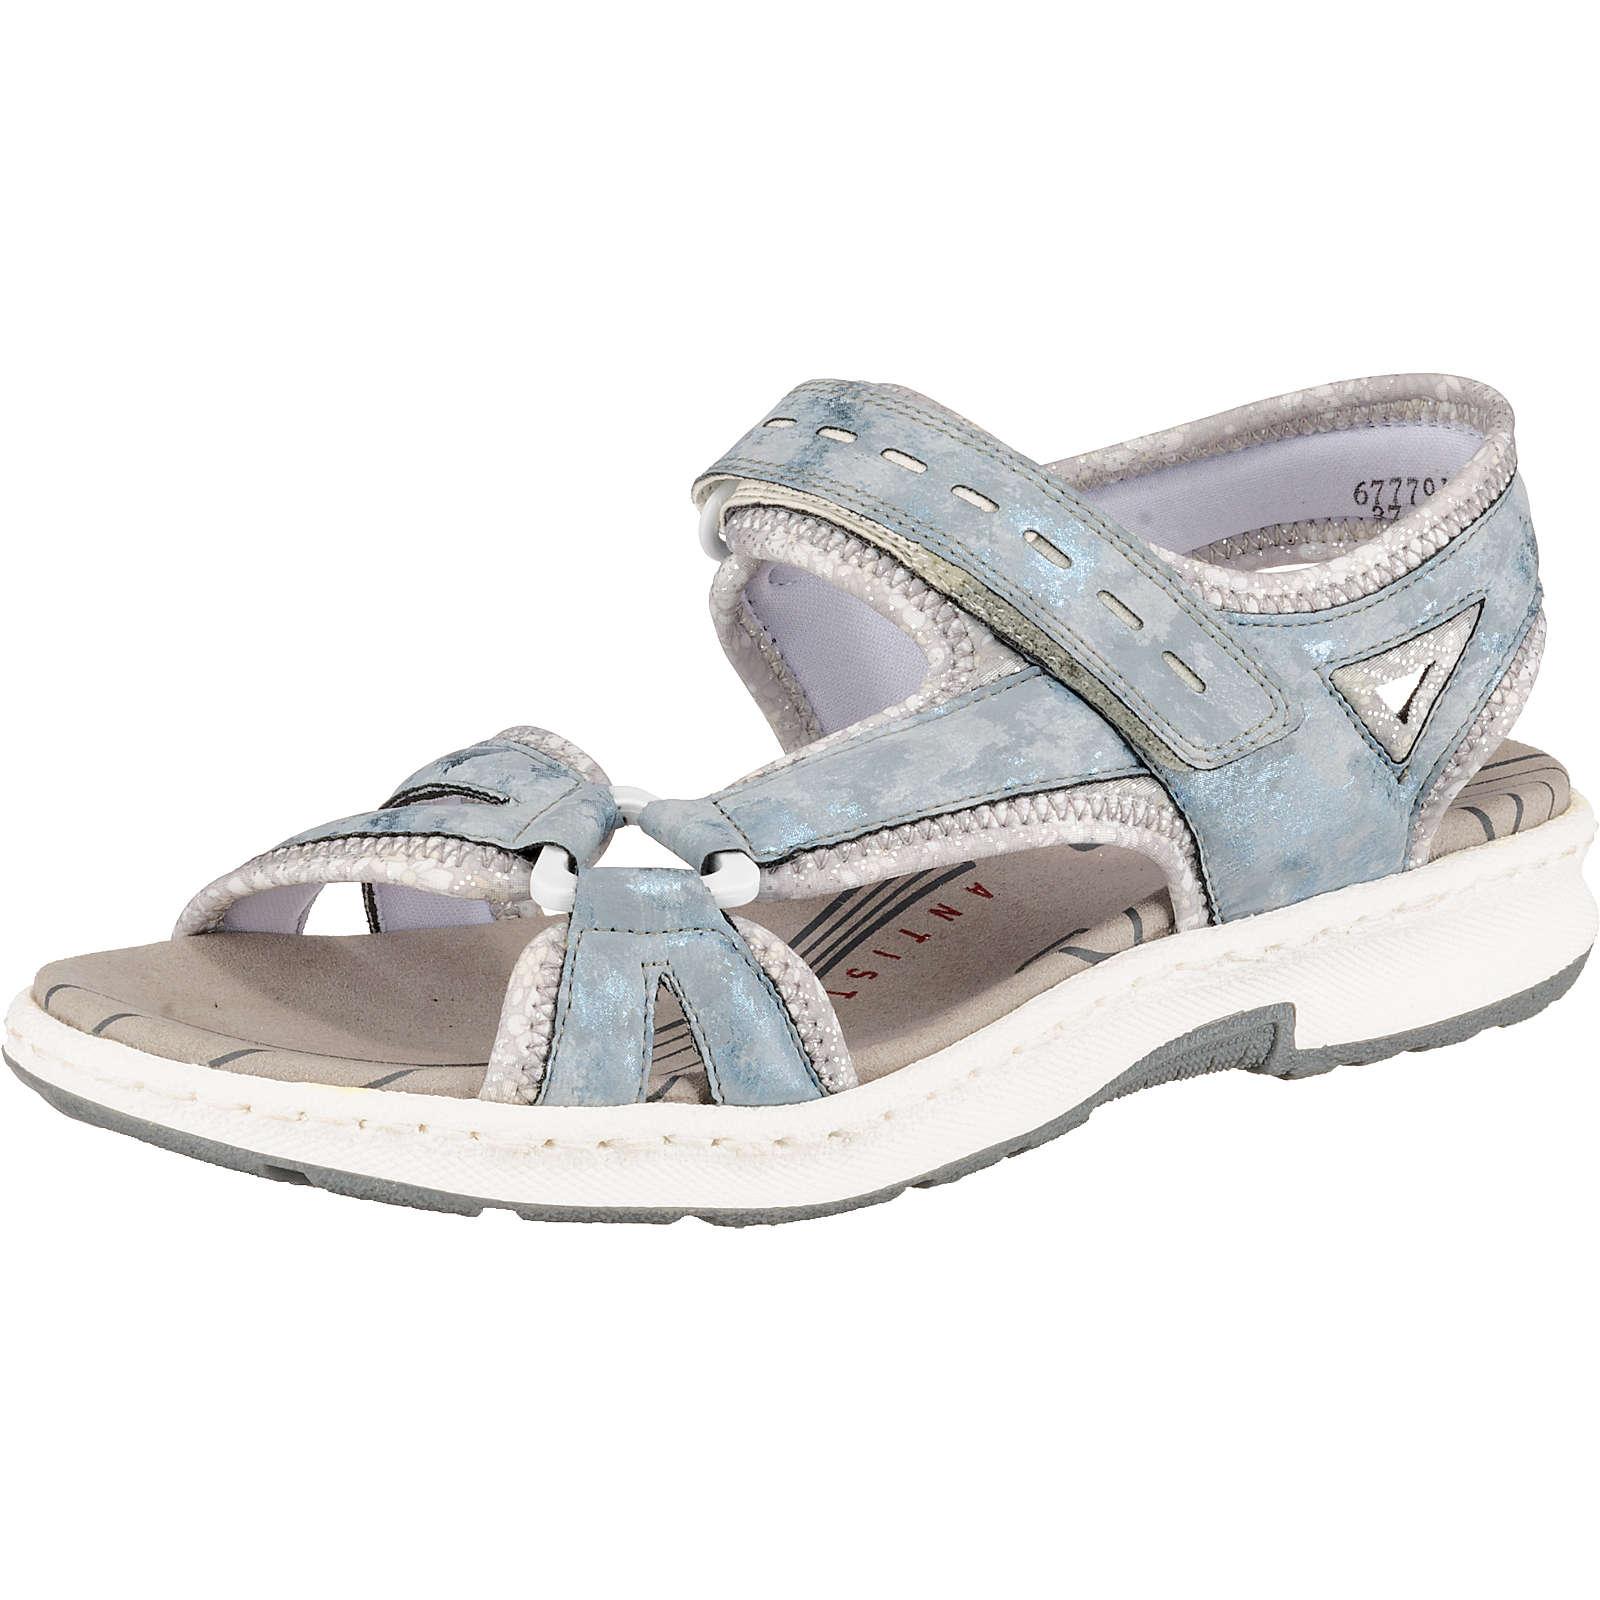 rieker Klassische Sandalen blau-kombi Damen Gr. 37